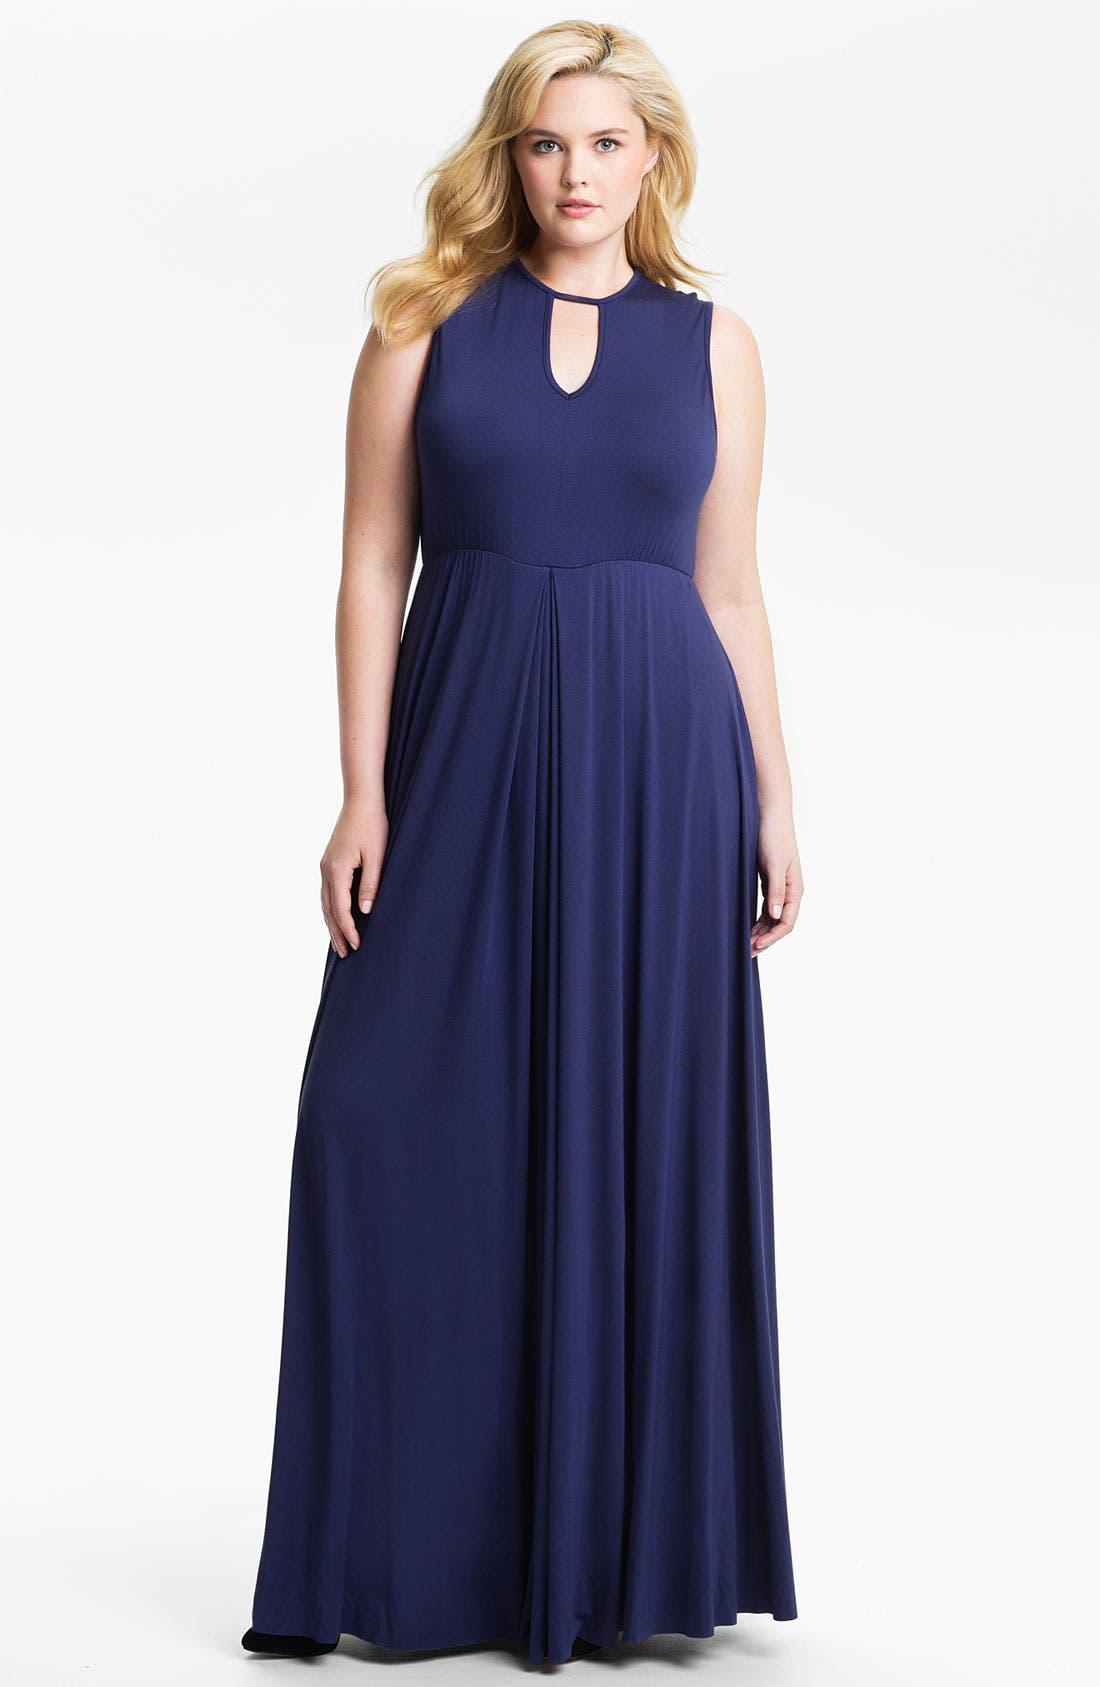 Alternate Image 1 Selected - Rachel Pally 'Isadora' Maxi Dress (Plus)